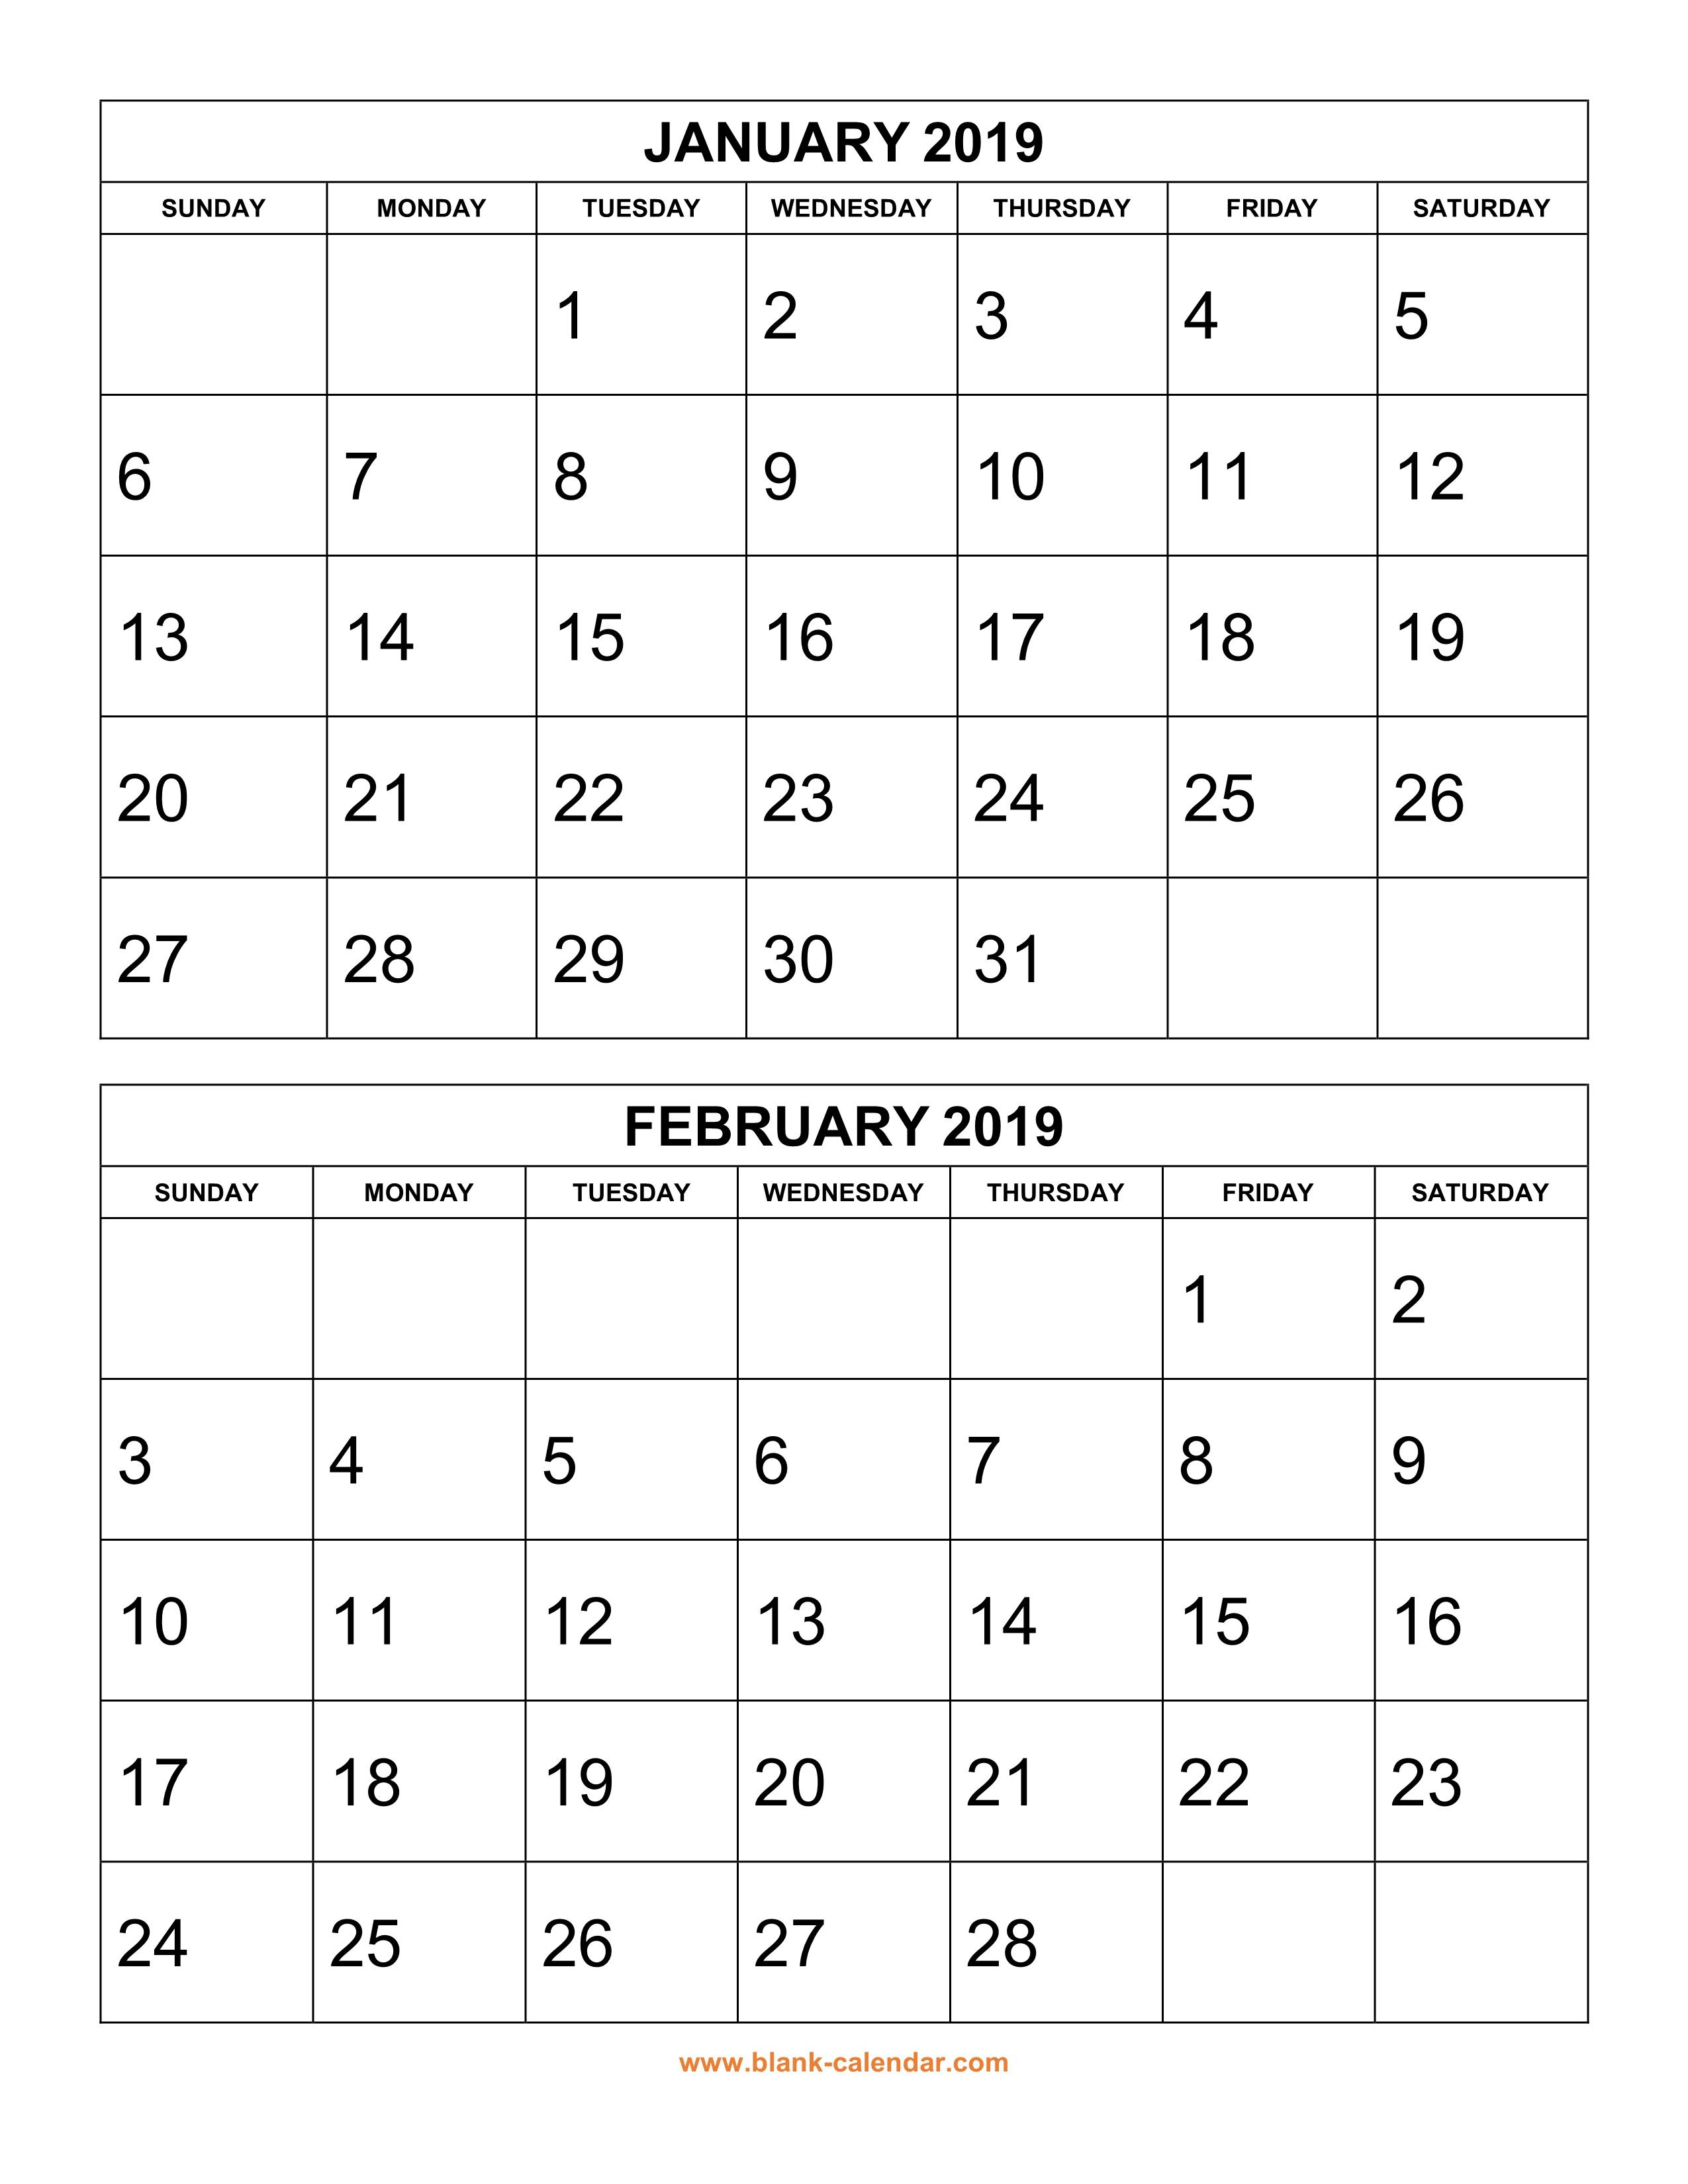 Free Download Printable Calendar 2019, 2 Months Per Page, 6 Pages in Blank 3 Month Printable Monthly Calendar